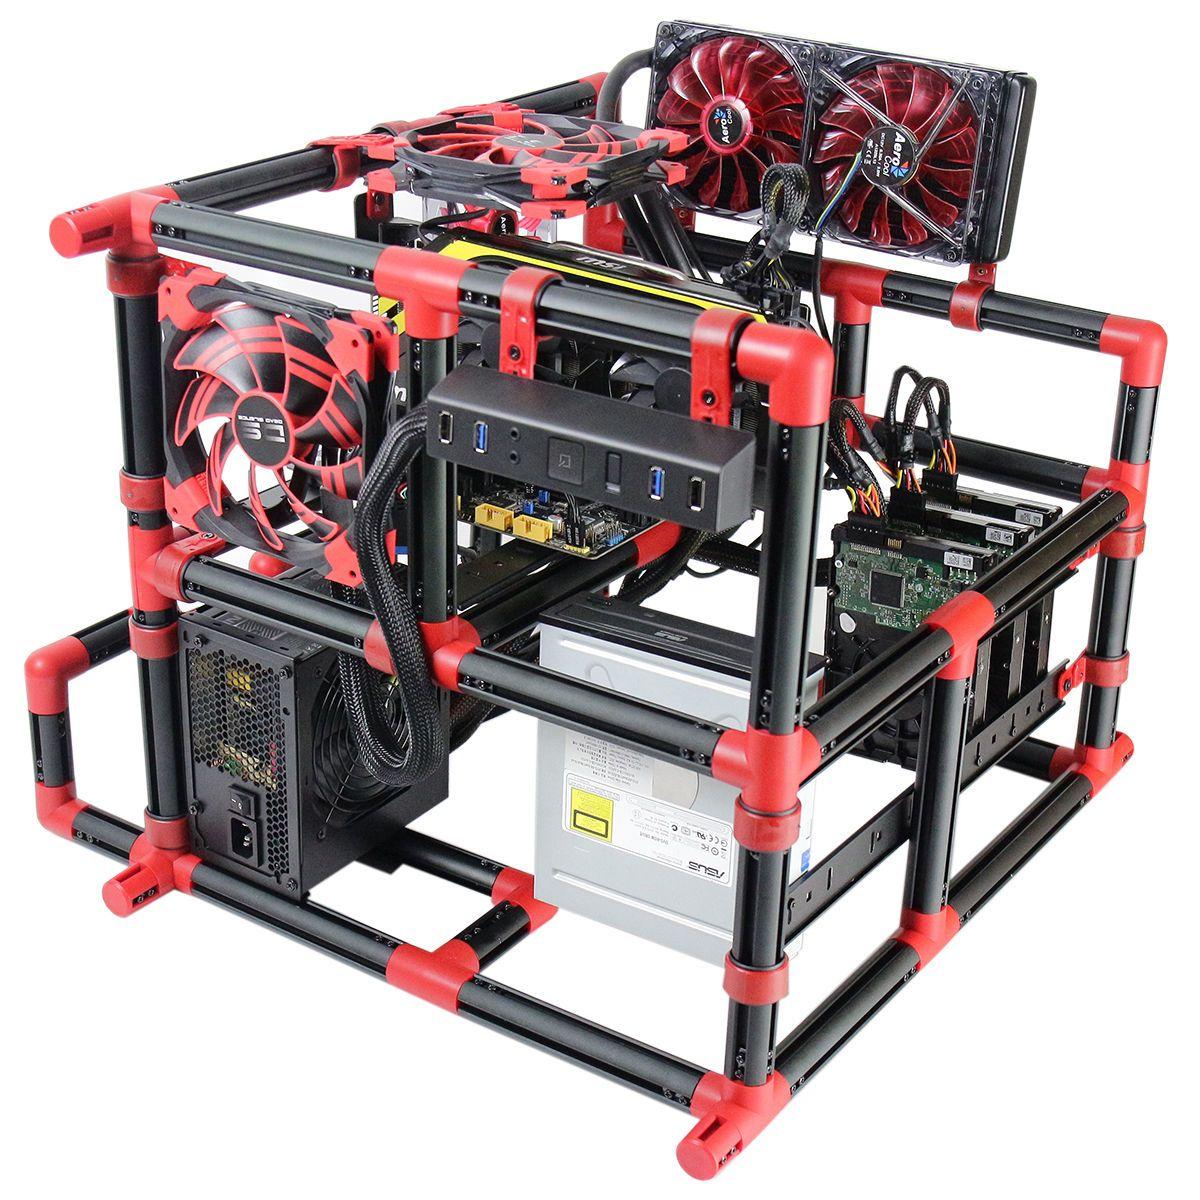 Aerocool Dream Box Creative DIY PC Computer Case Building Kit Design Tower